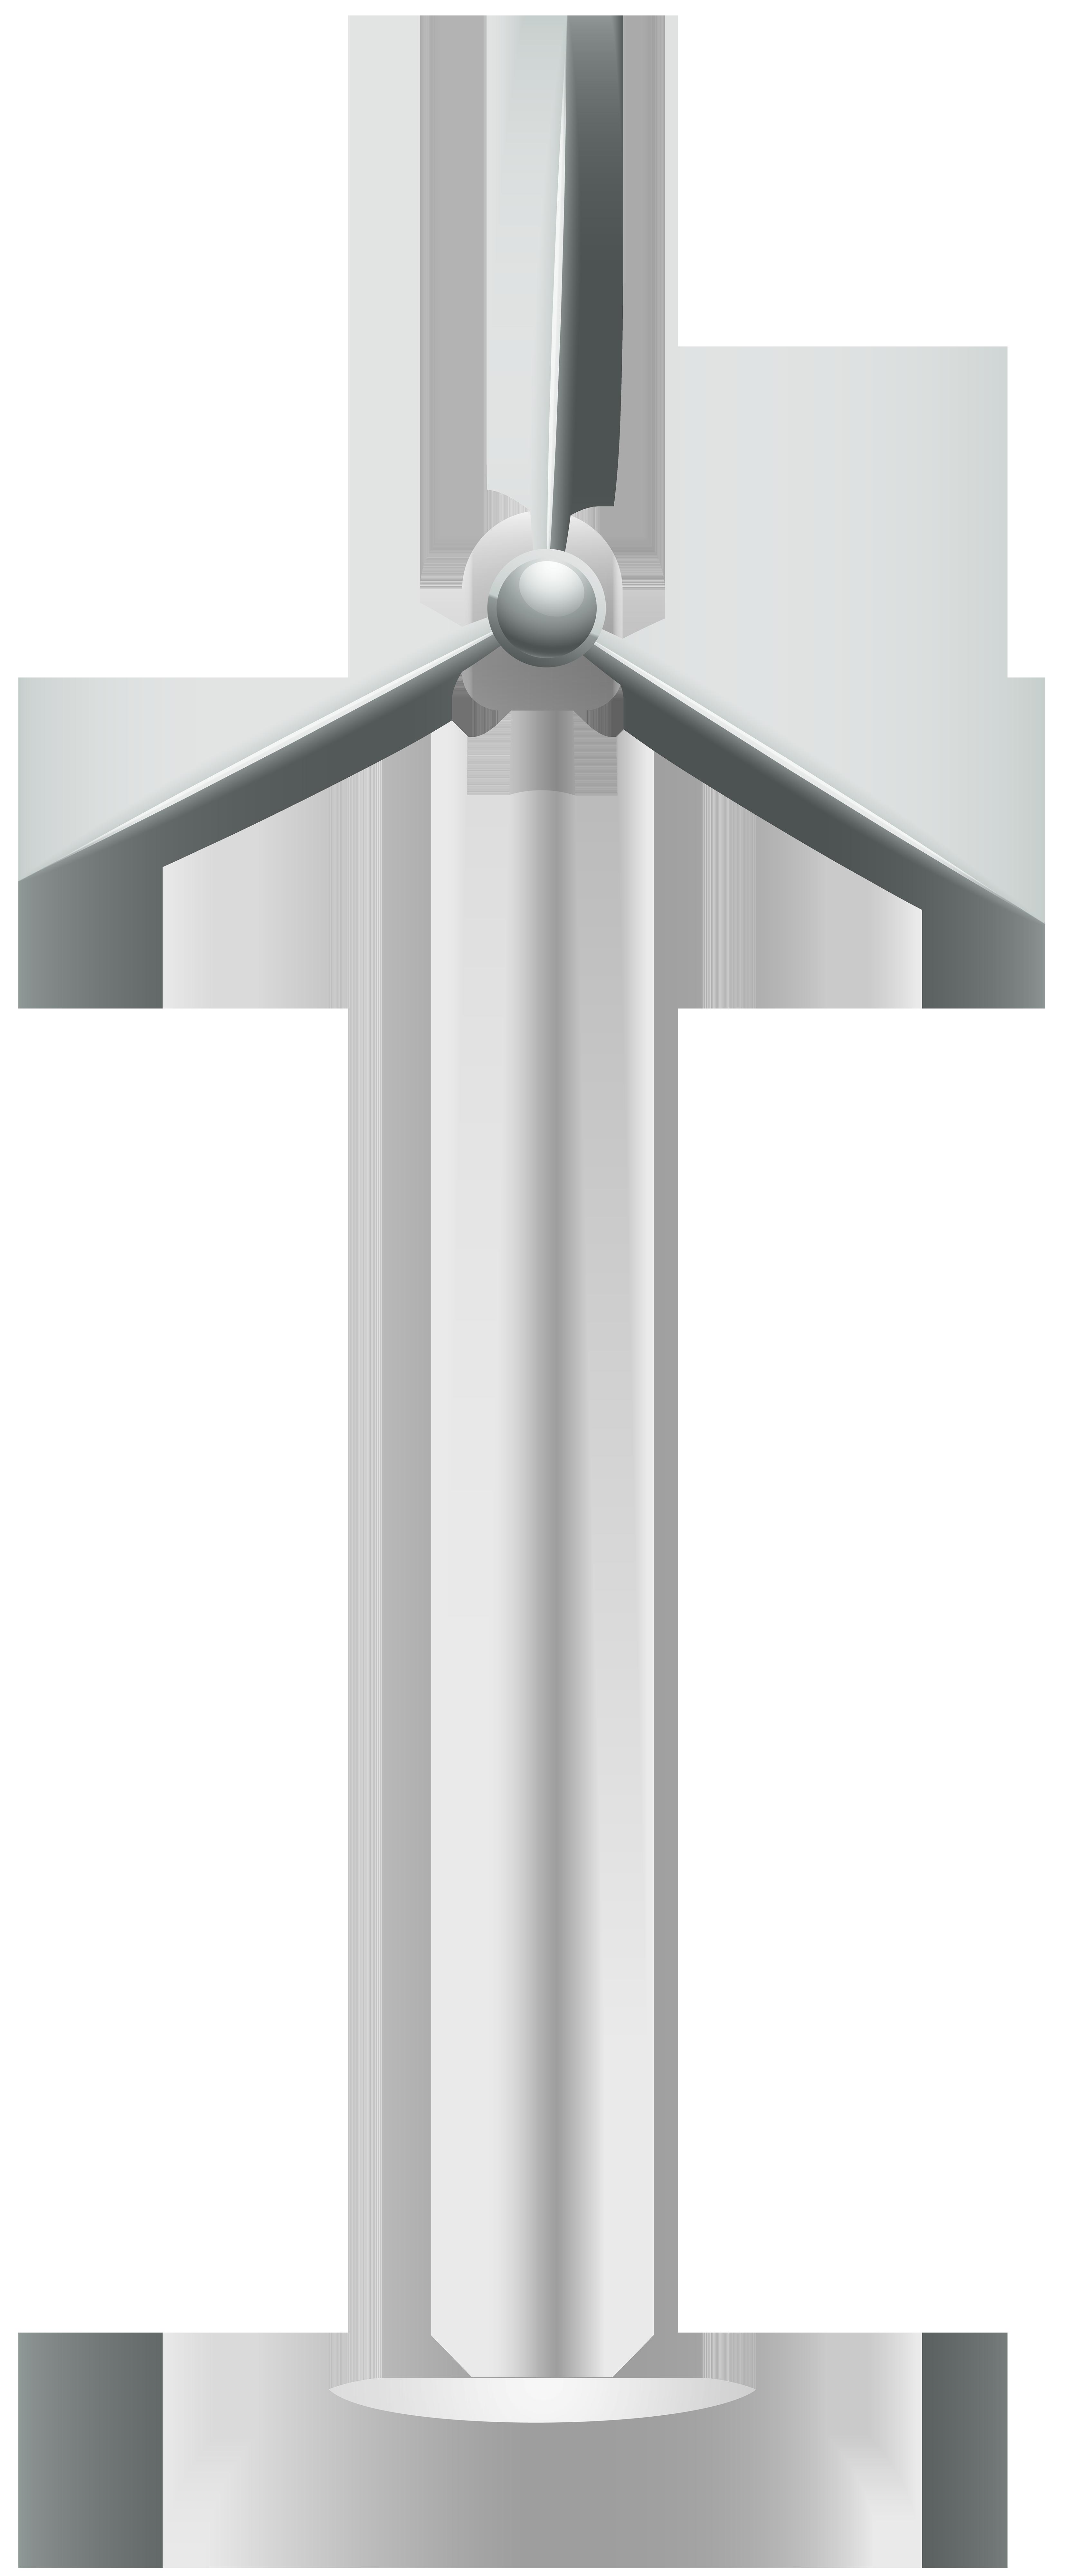 3d wind turbine clipart graphic free New wind turbine life free energy clip art - ClipartBarn graphic free